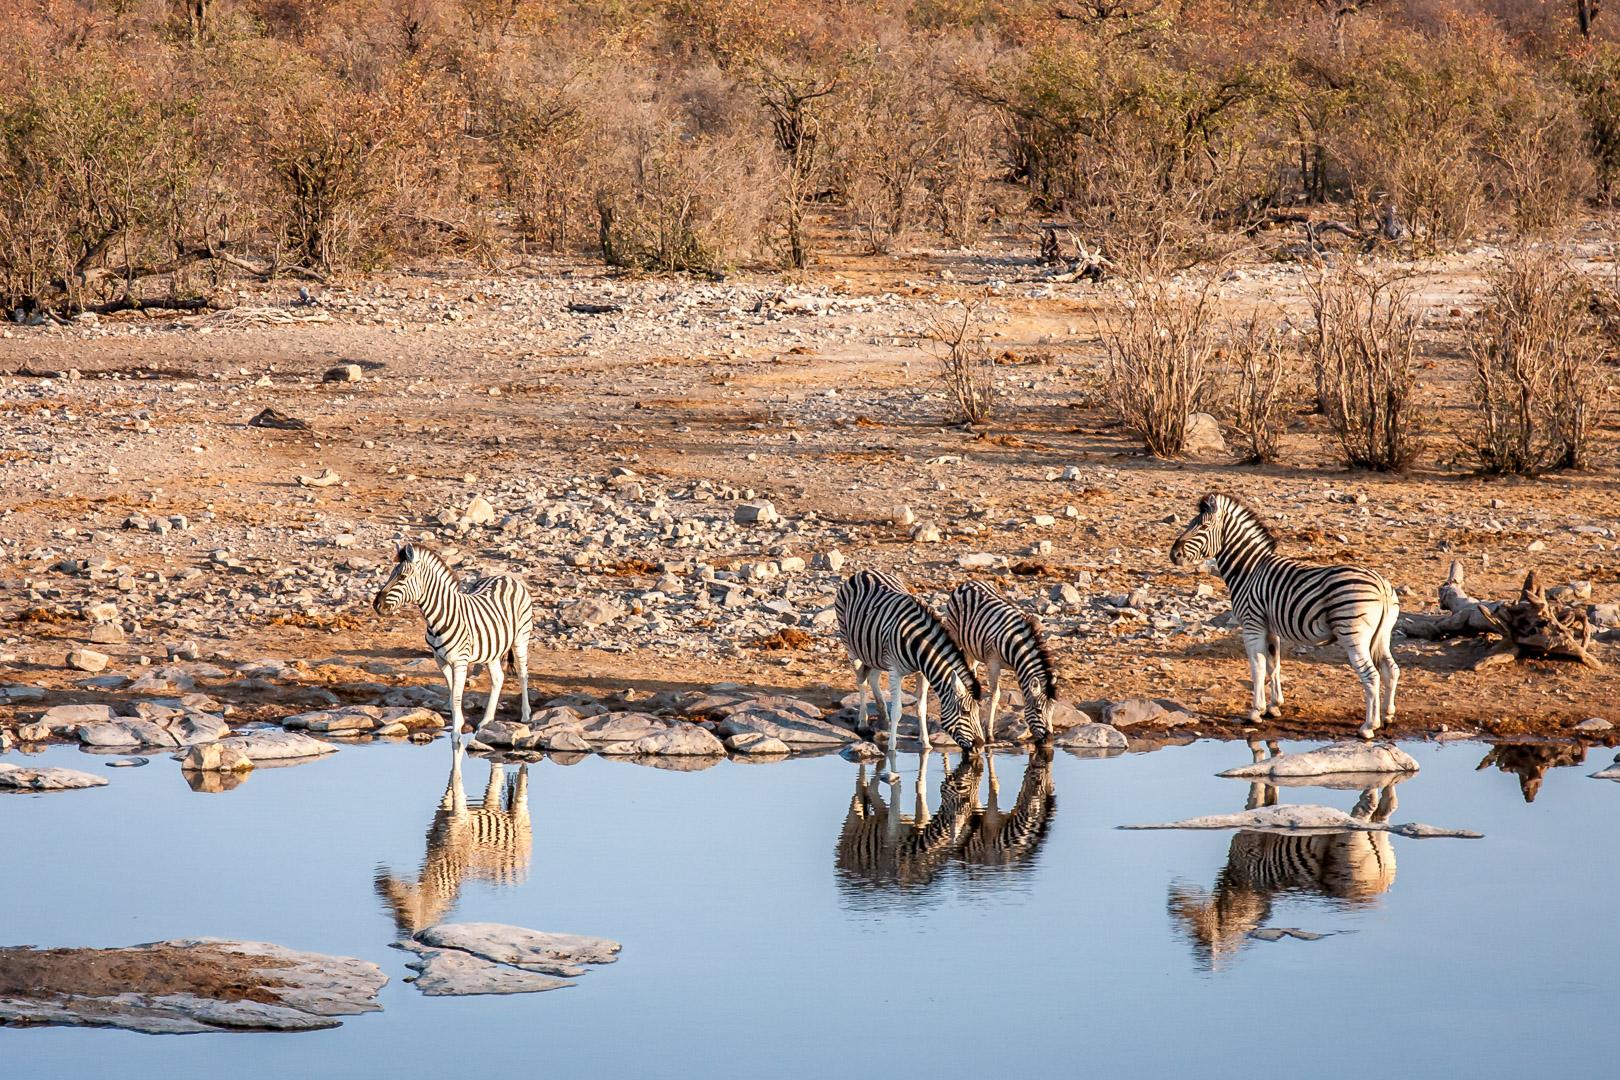 27.7. Moringa Waterhole, Halali - Der Löwe brüllt!